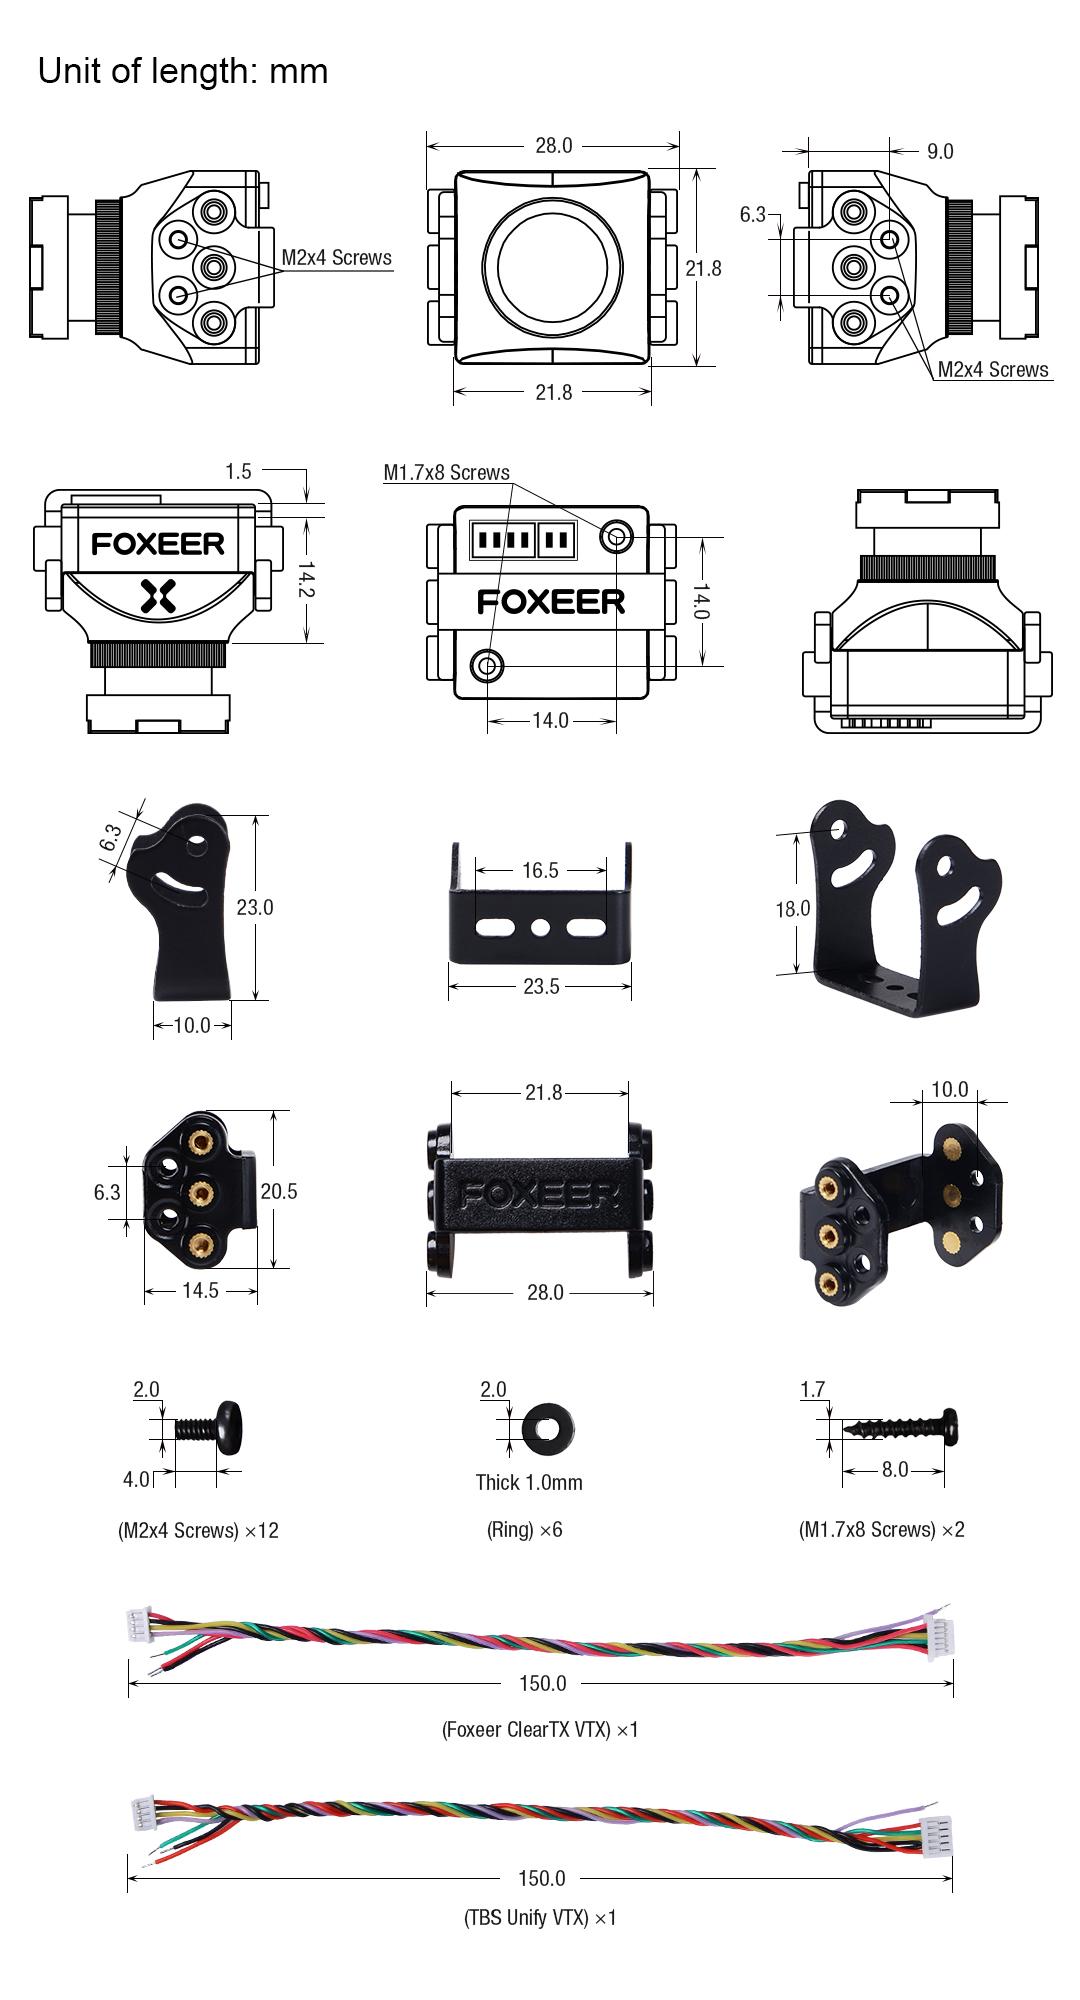 Rozmiary kamerki FPV Foxeer Predator V3